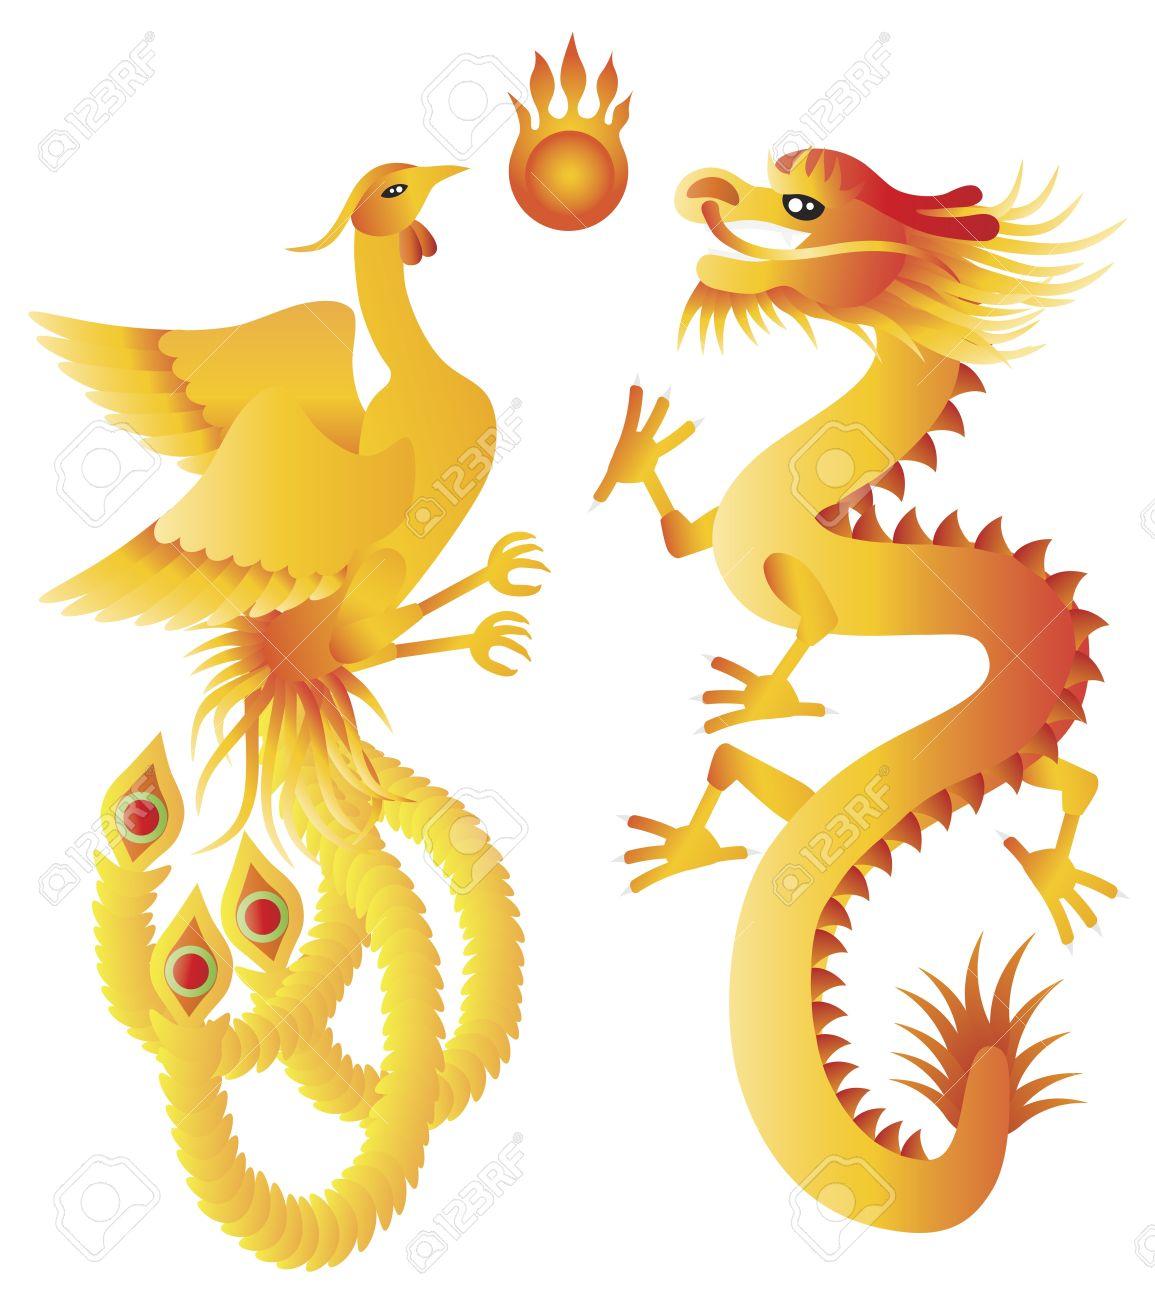 Dragon and phoenix symbols for chinese wedding with flaming dragon and phoenix symbols for chinese wedding with flaming ball illustration isolated on white background stock buycottarizona Gallery